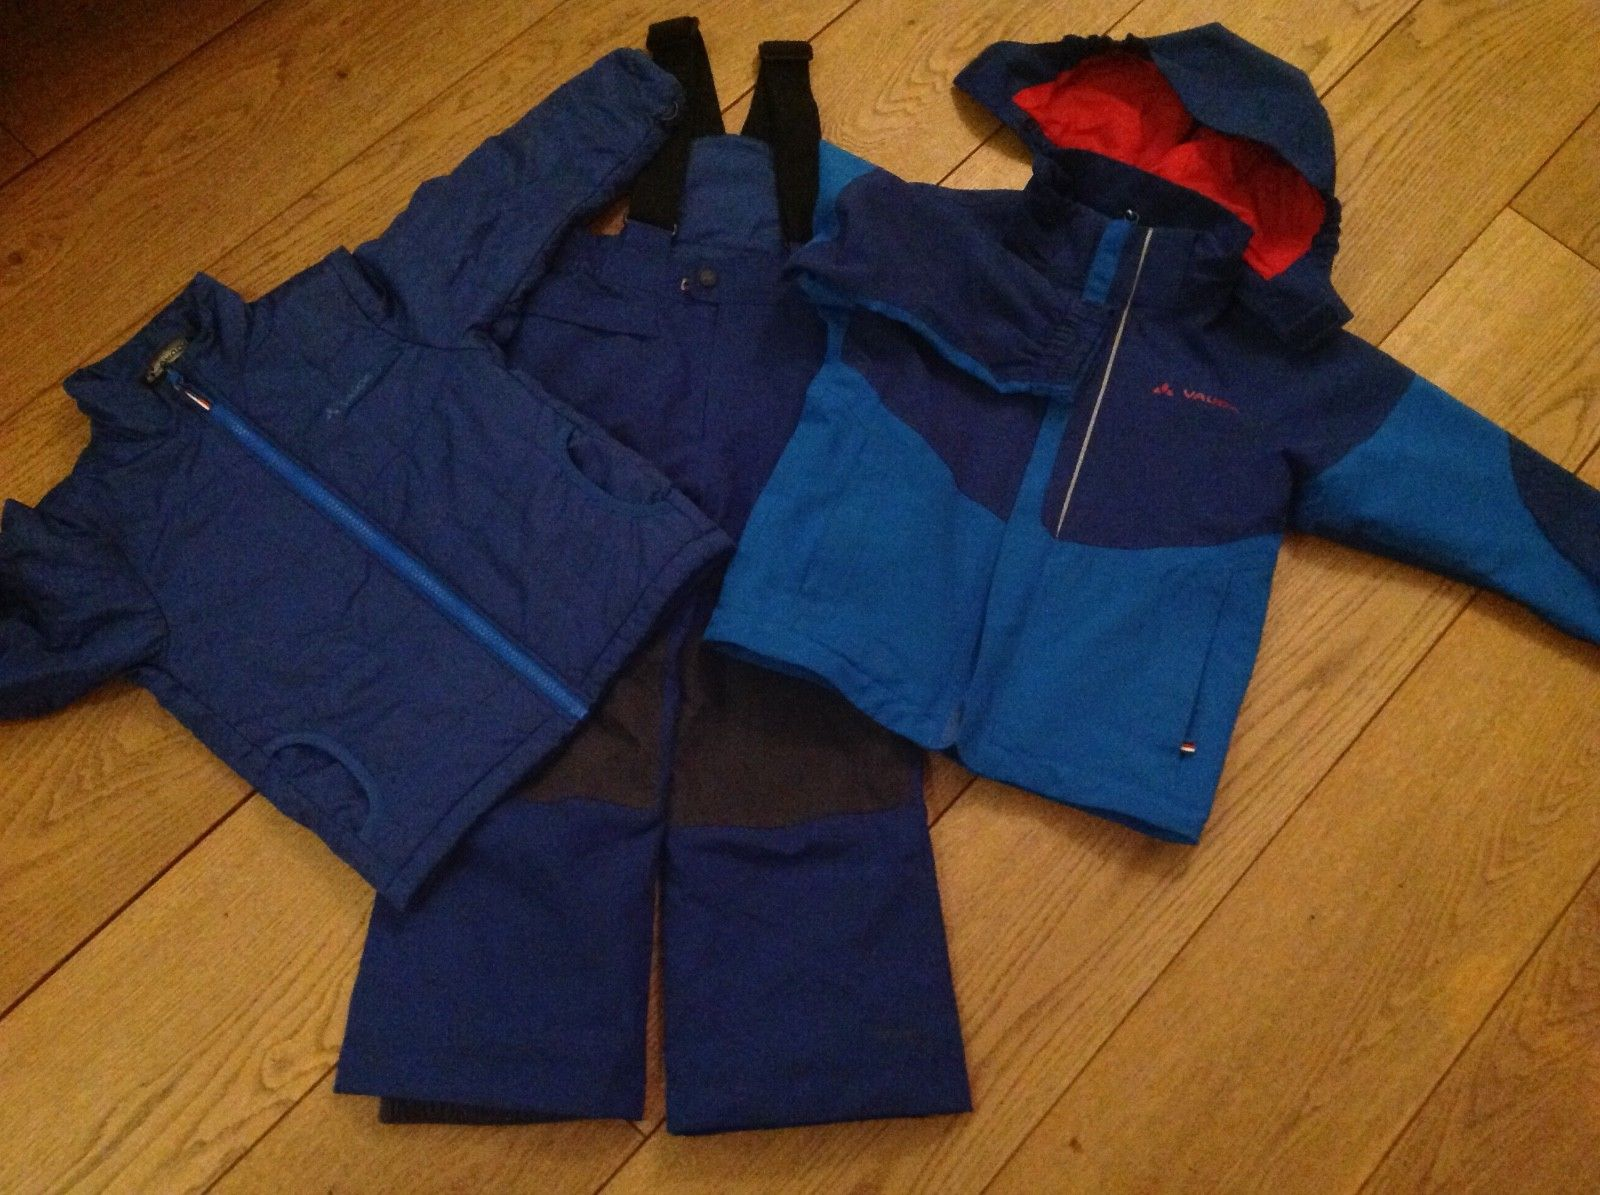 Vaude Skianzug / Schneeanzug Kids Suricate 3in1 Jacket 110 - 116 blau